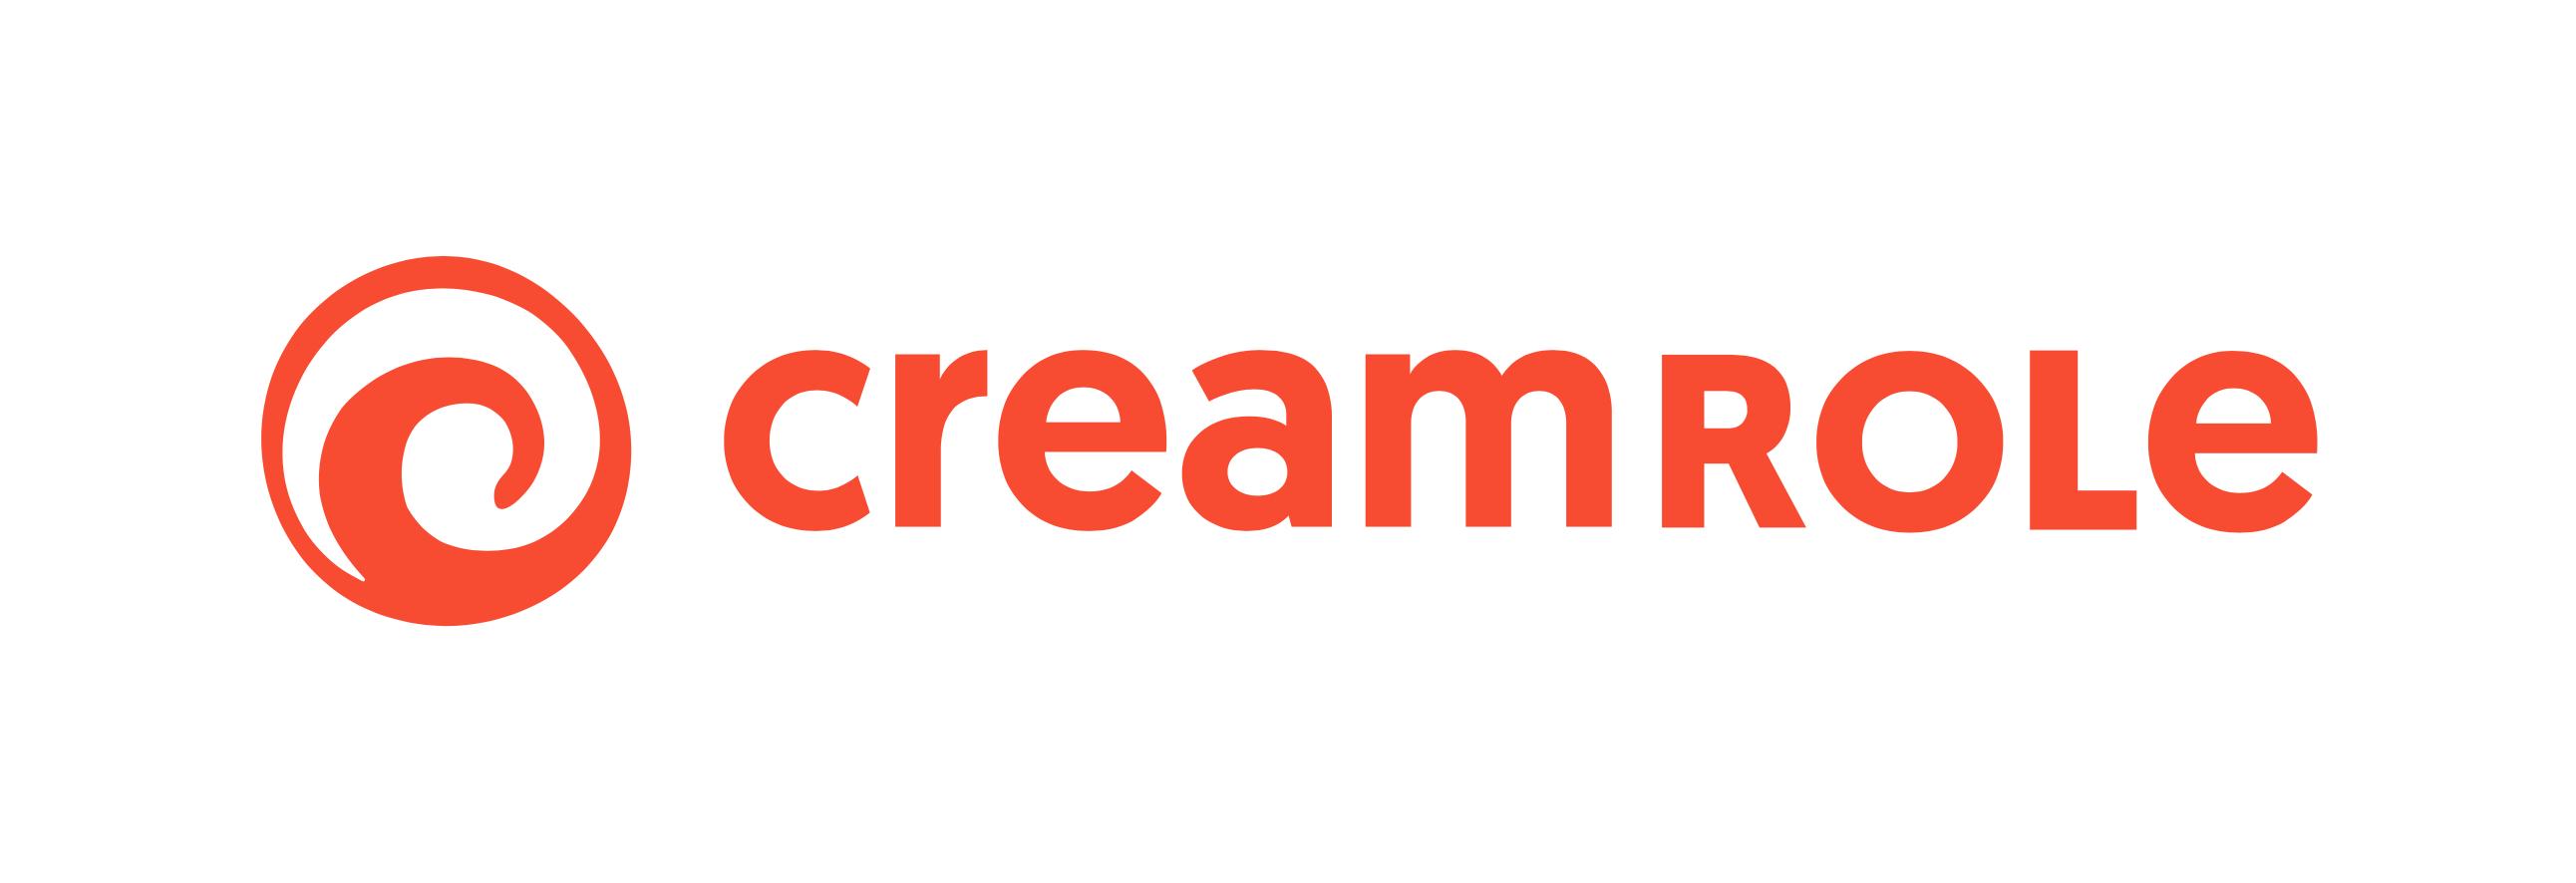 Creamrole Logo